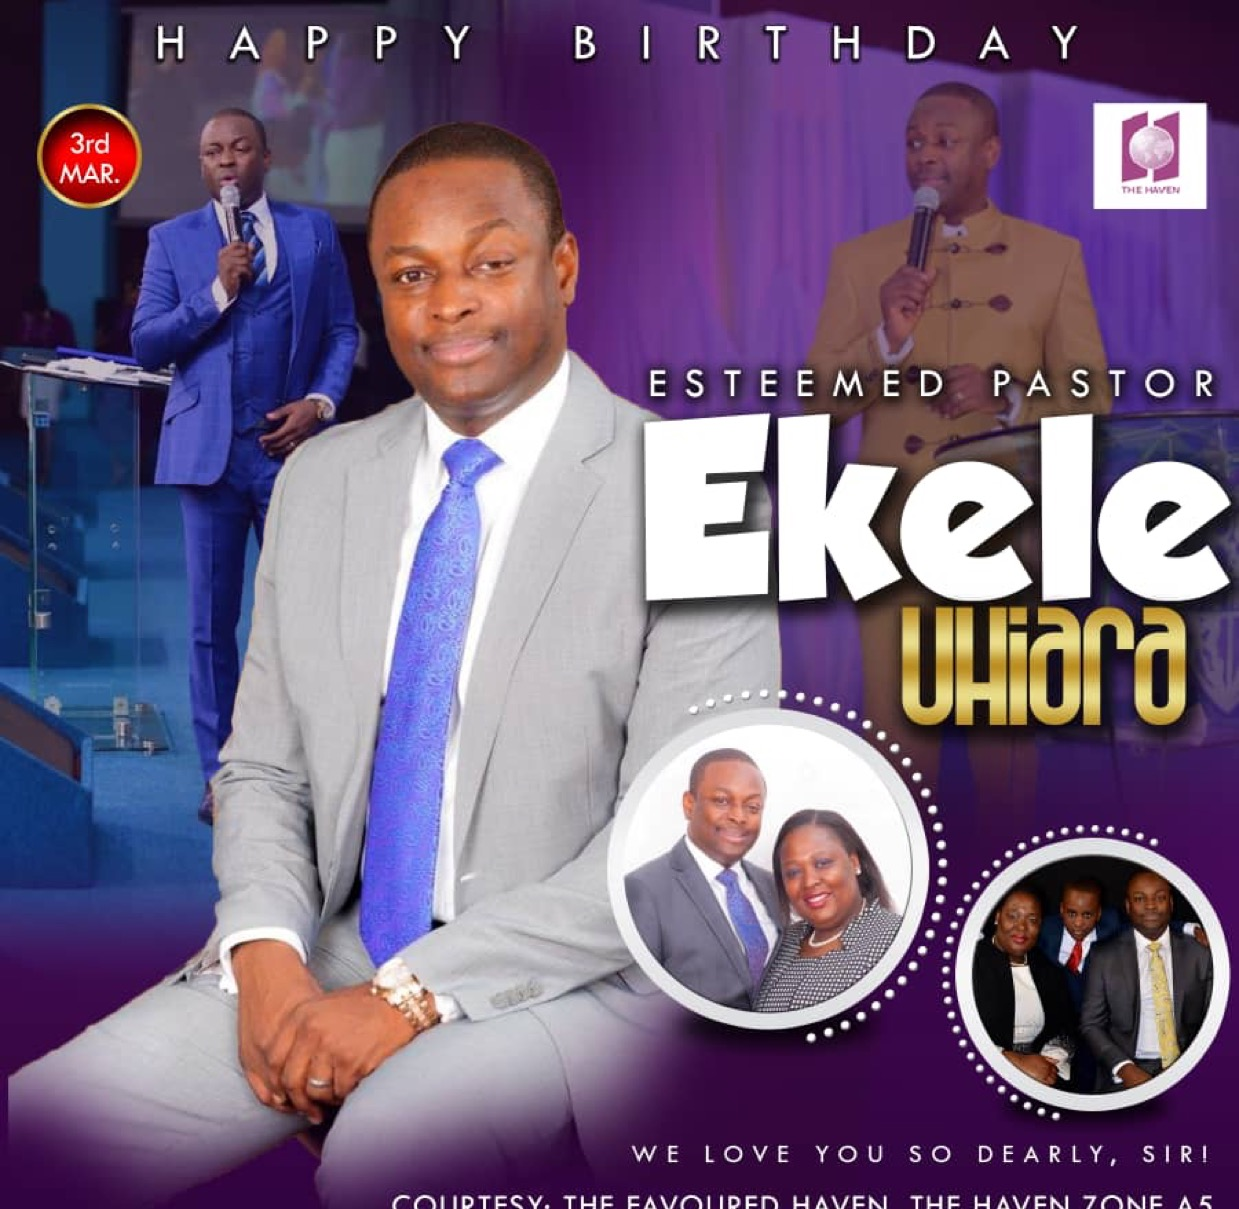 Happy birthday Esteemed President sir,